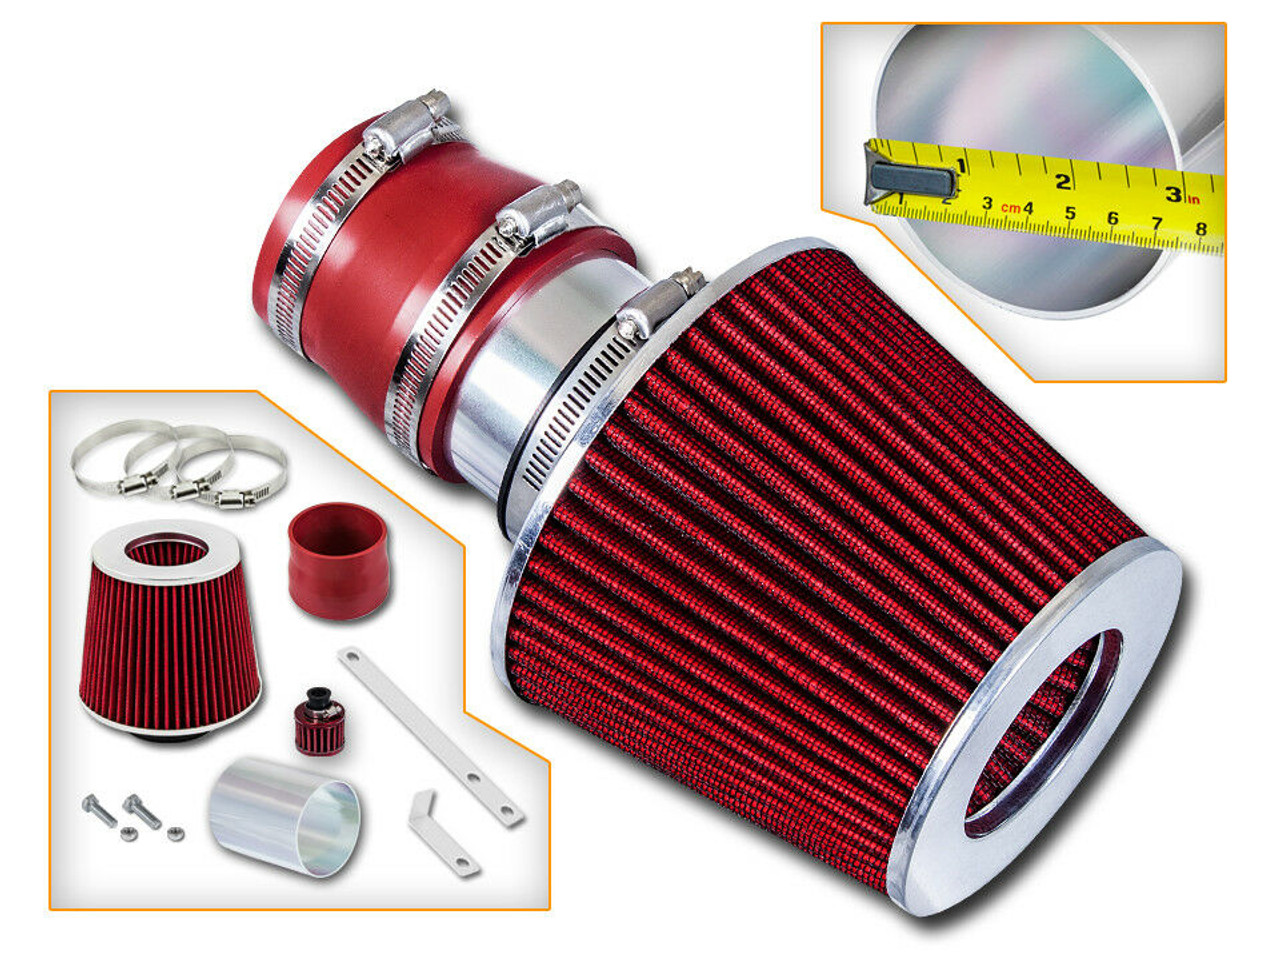 Cold Air Intake for VW Jetta, Golf, Beetle (1999-2005) 1.8L / 1.9L / 2.0L /  2.8L Engines - Performance Chip Tuning | 99 Jetta 2 0 Engine Diagram Intake |  | Performance Chip Tuning